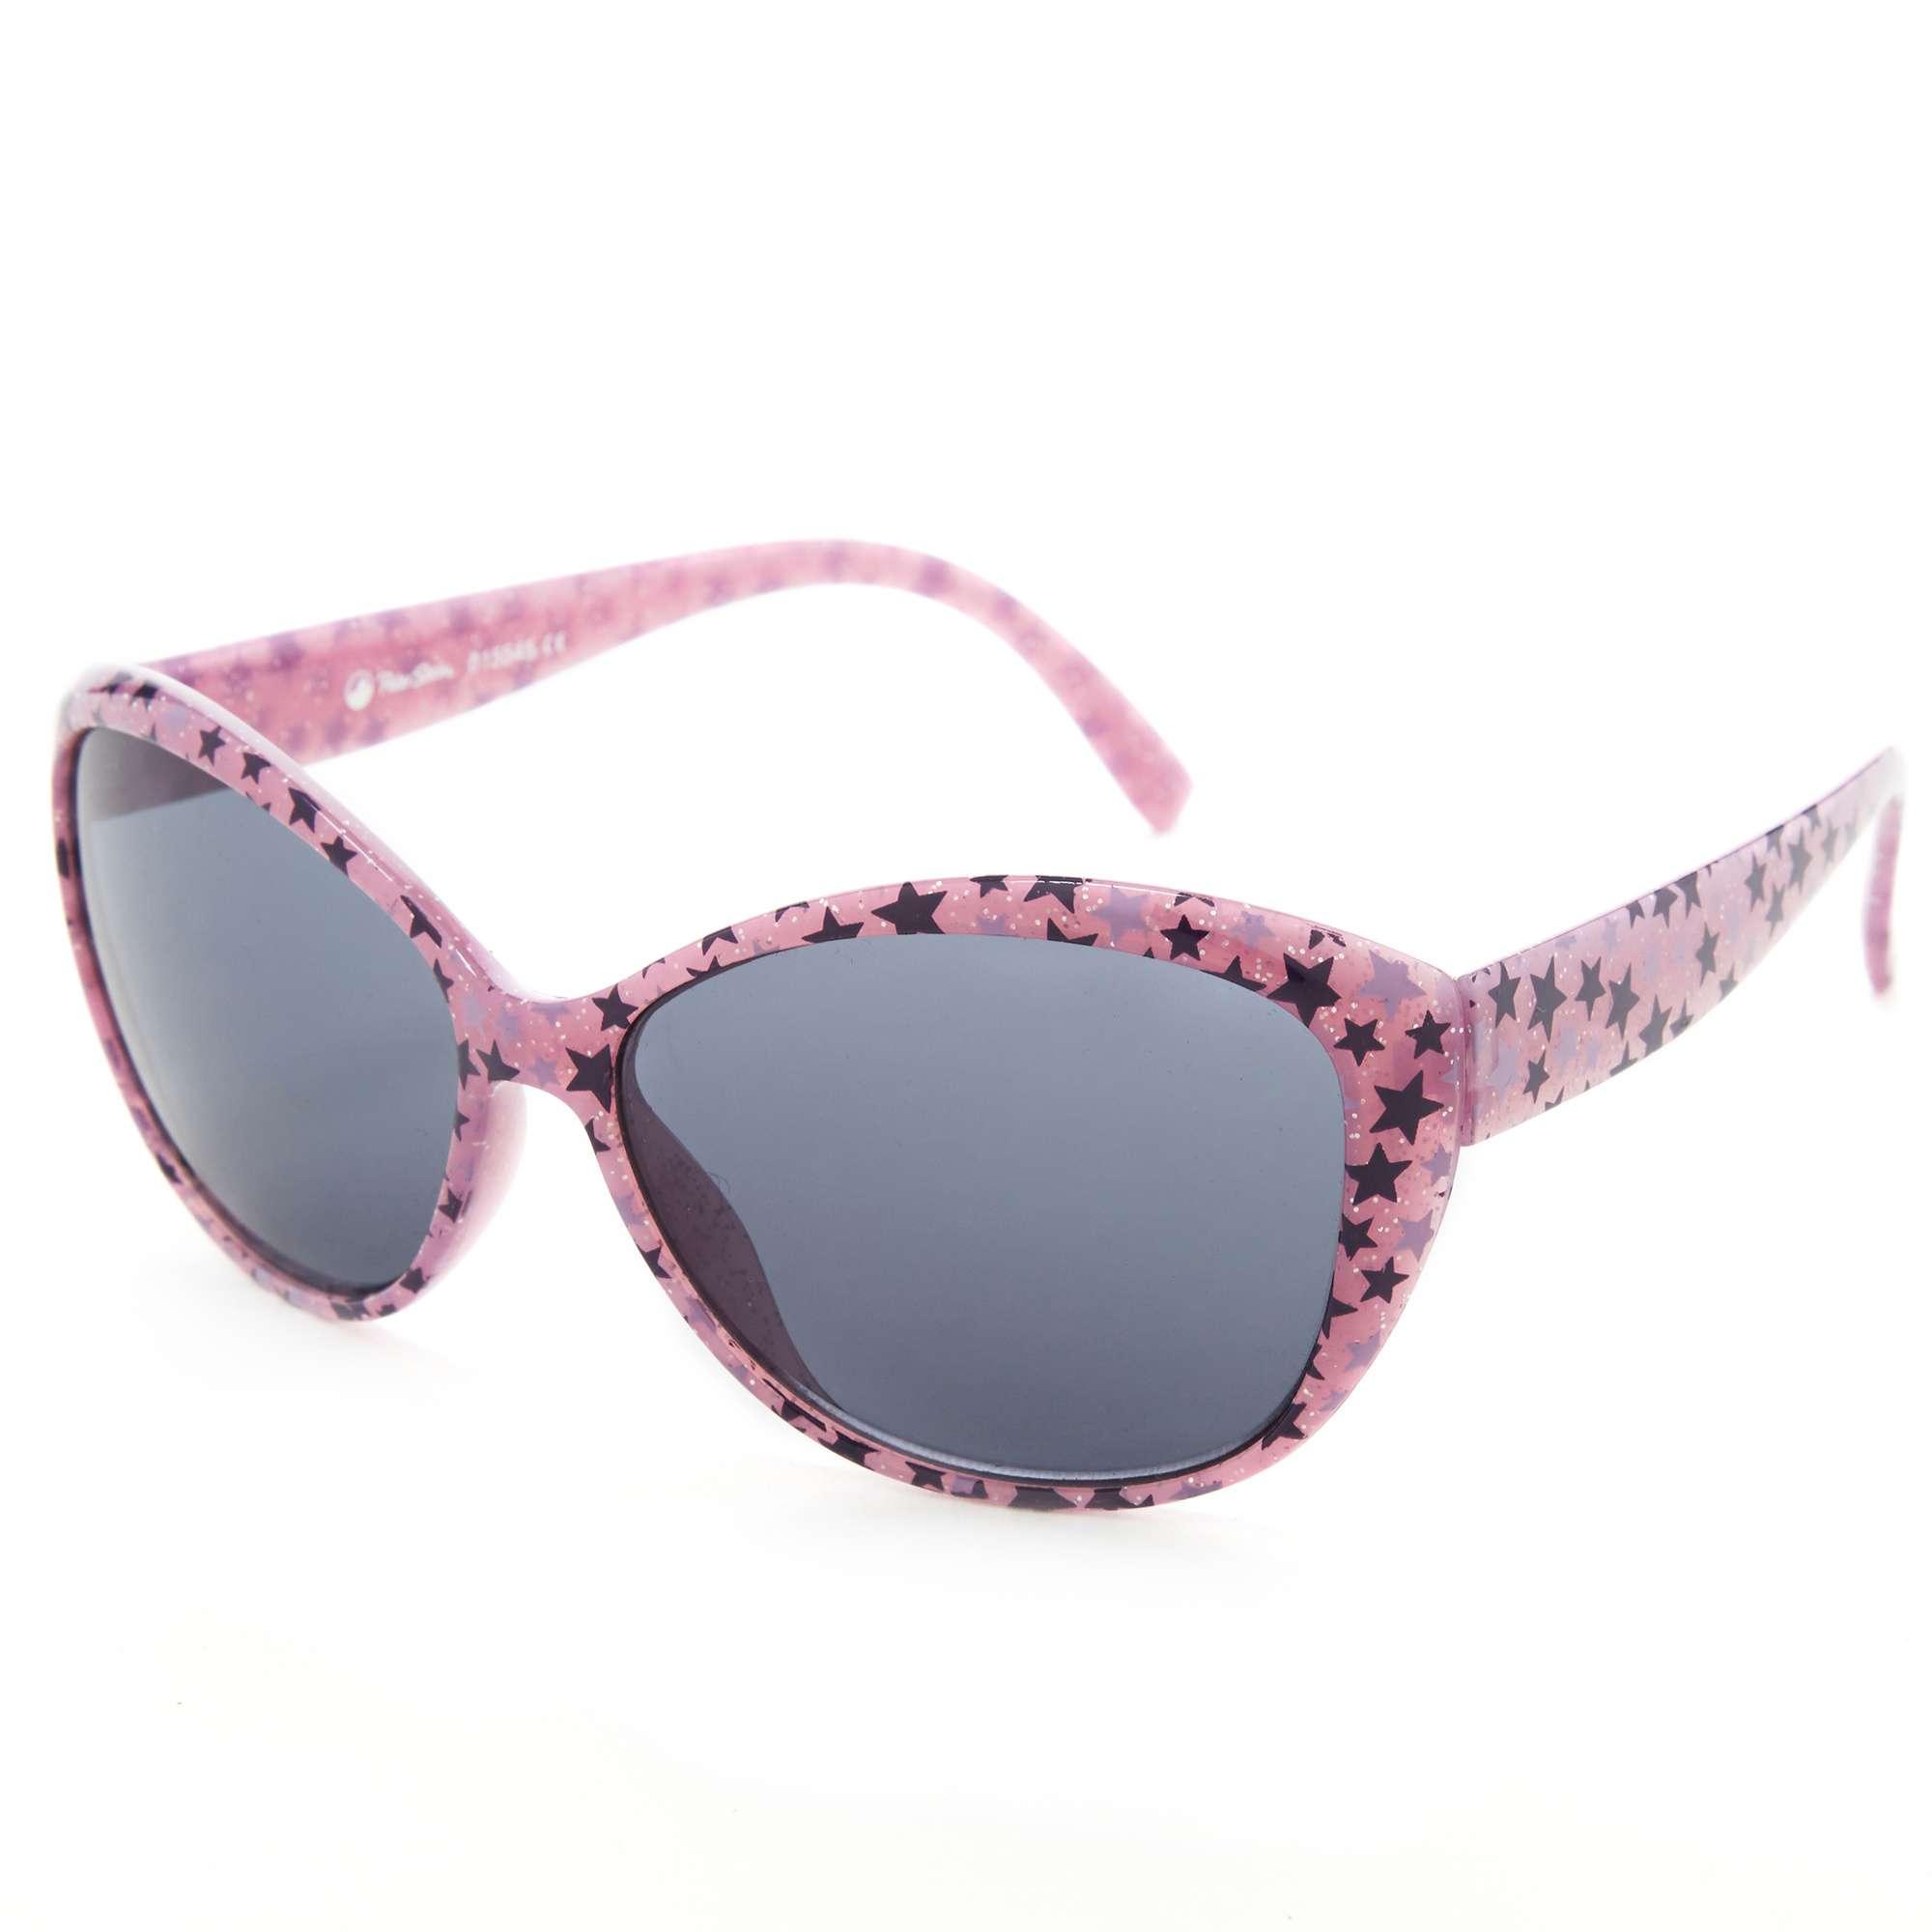 PETER STORM Girls' Catseye Sunglasses